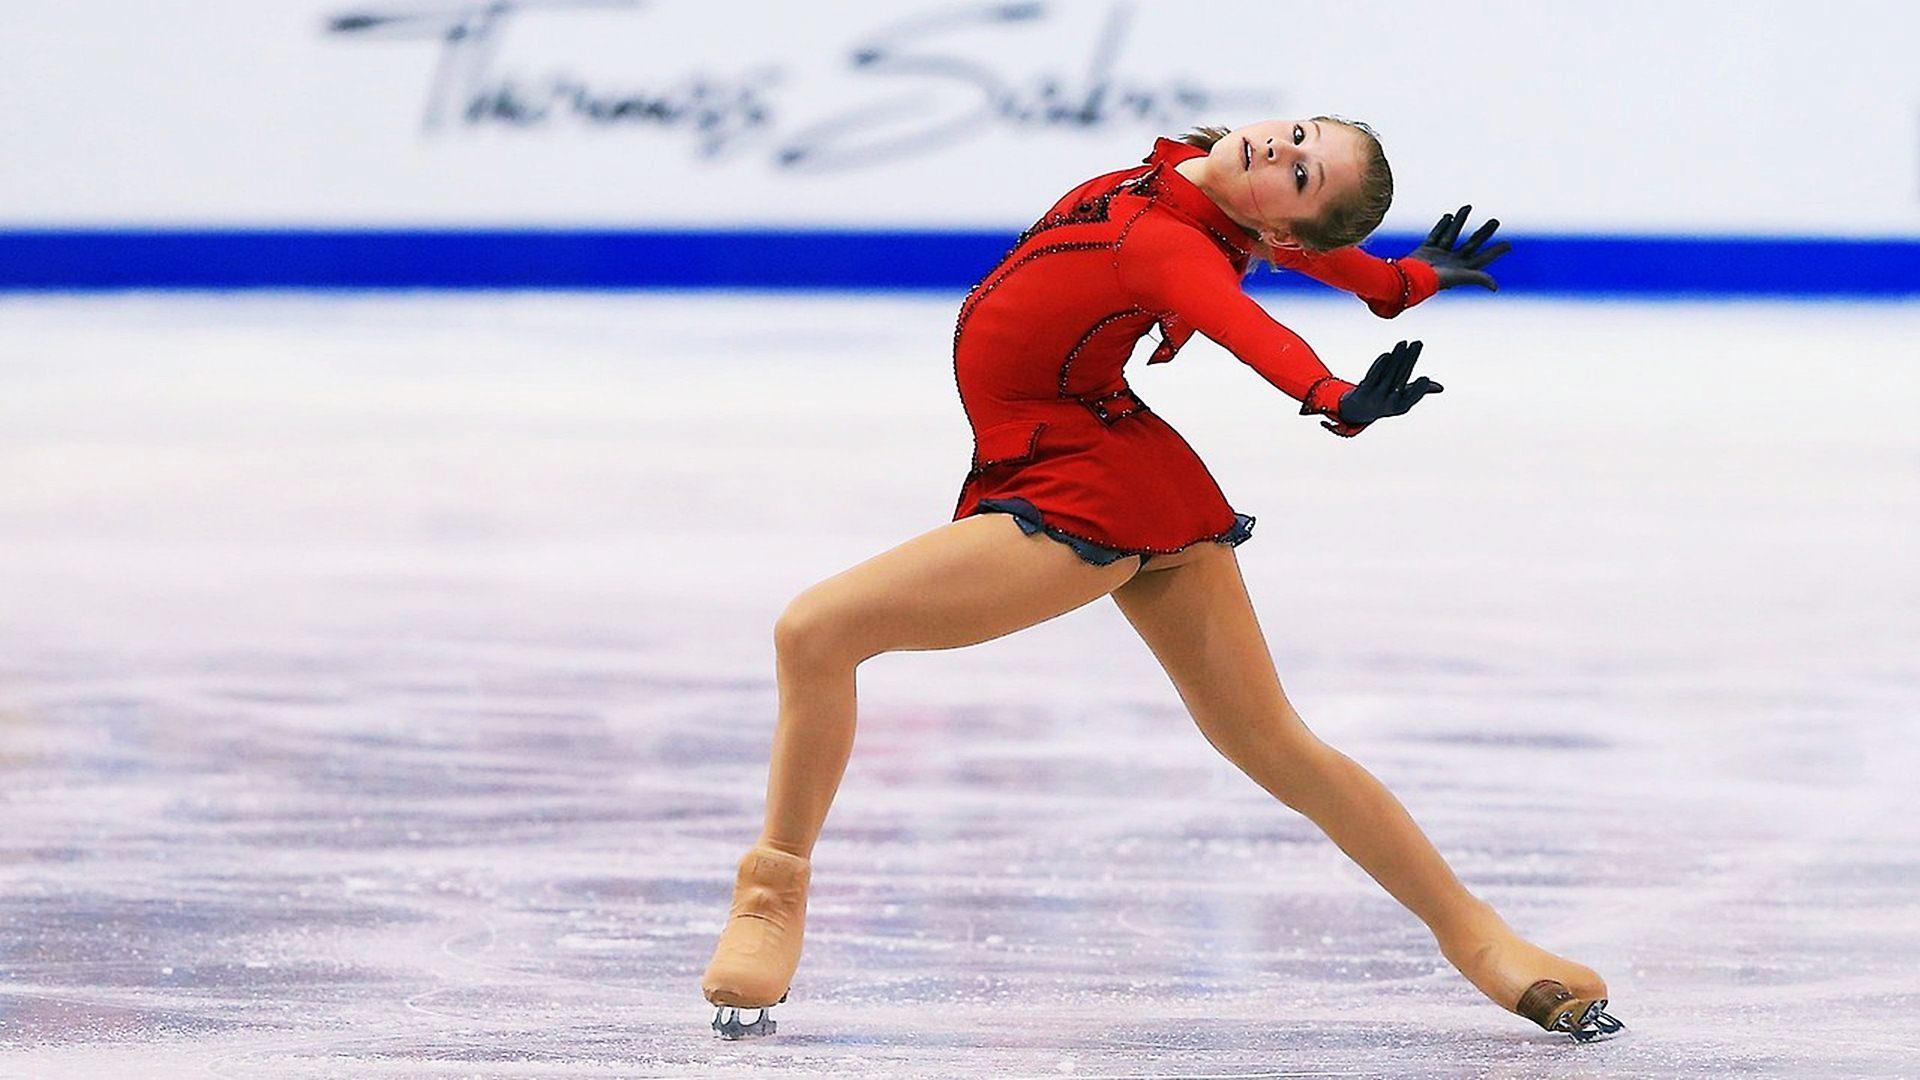 Res: 1920x1080, HD Julia Lipnitskaia Figure Skating Player Wallpaper | Download .